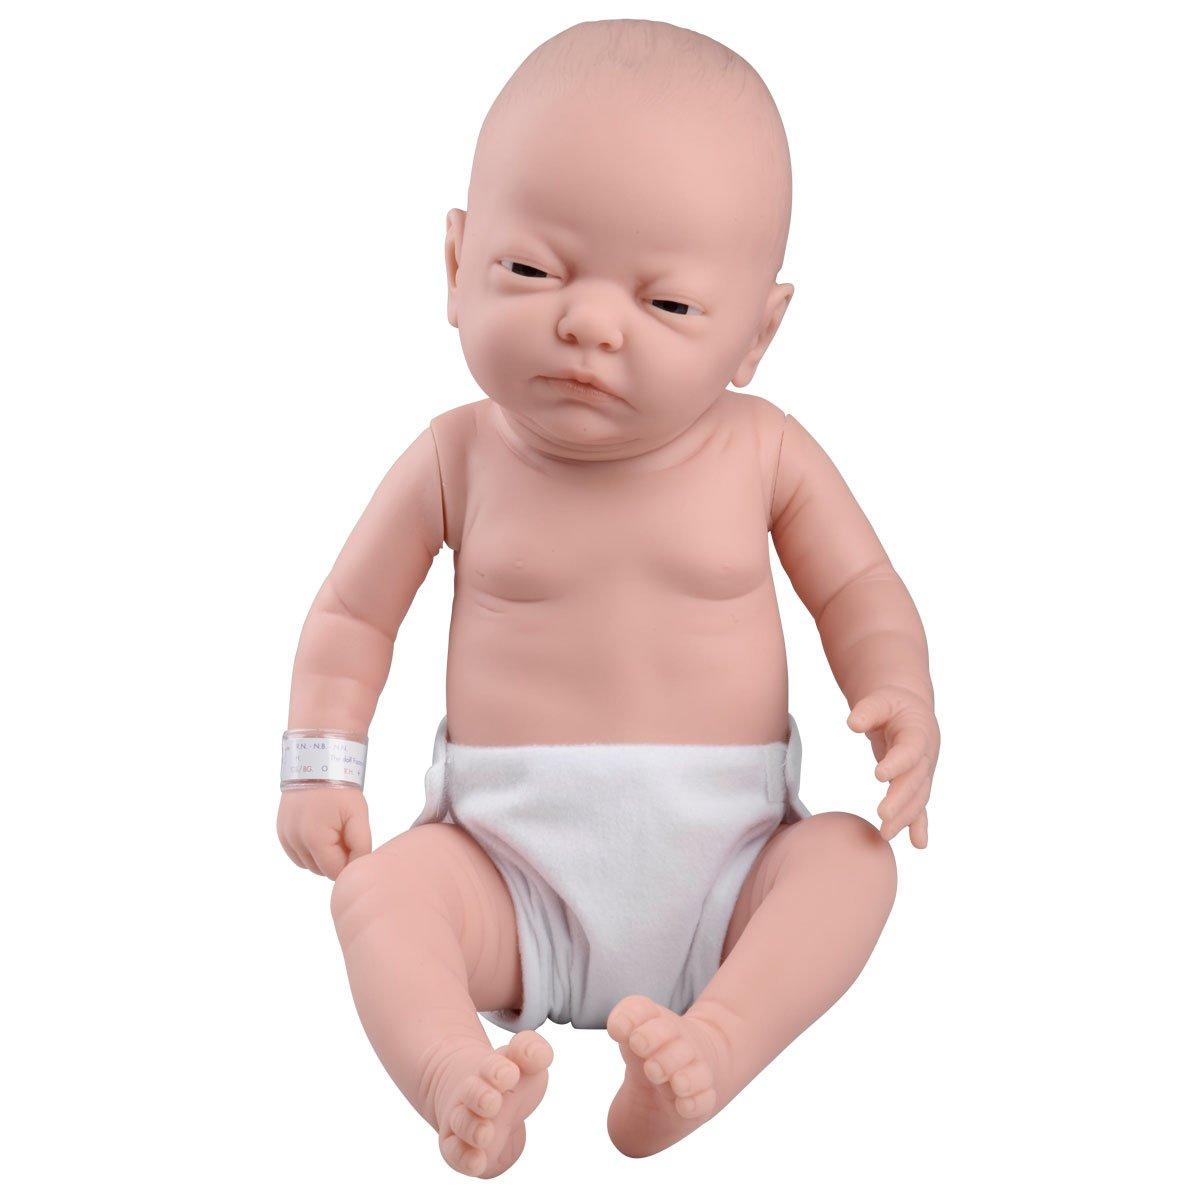 Afroamerikanisch Belonil Baby-Pflegepuppe 1